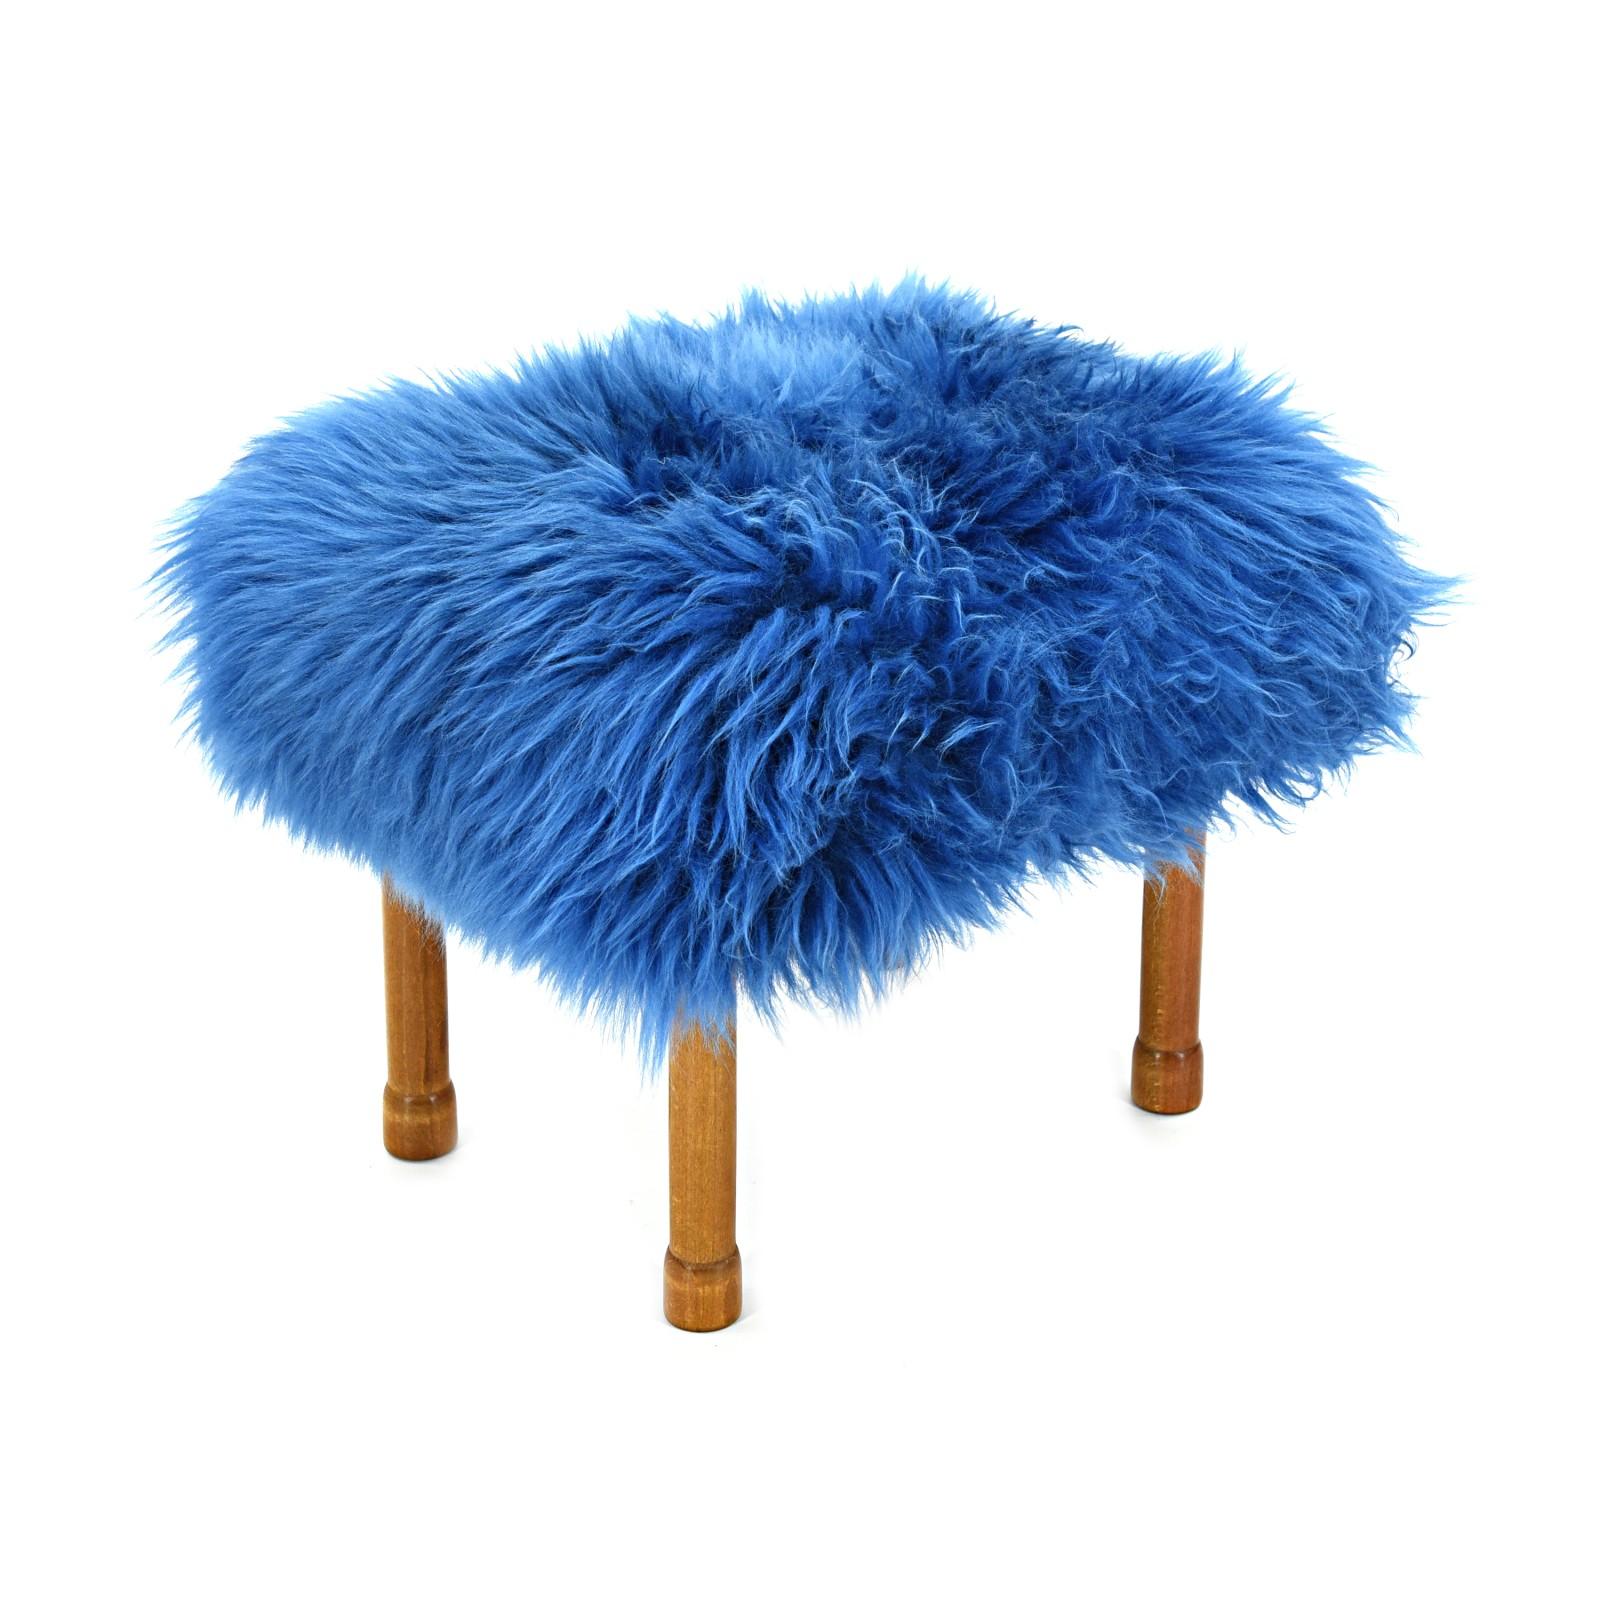 Myfanwy Sheepskin Footstool Cornflower Blue